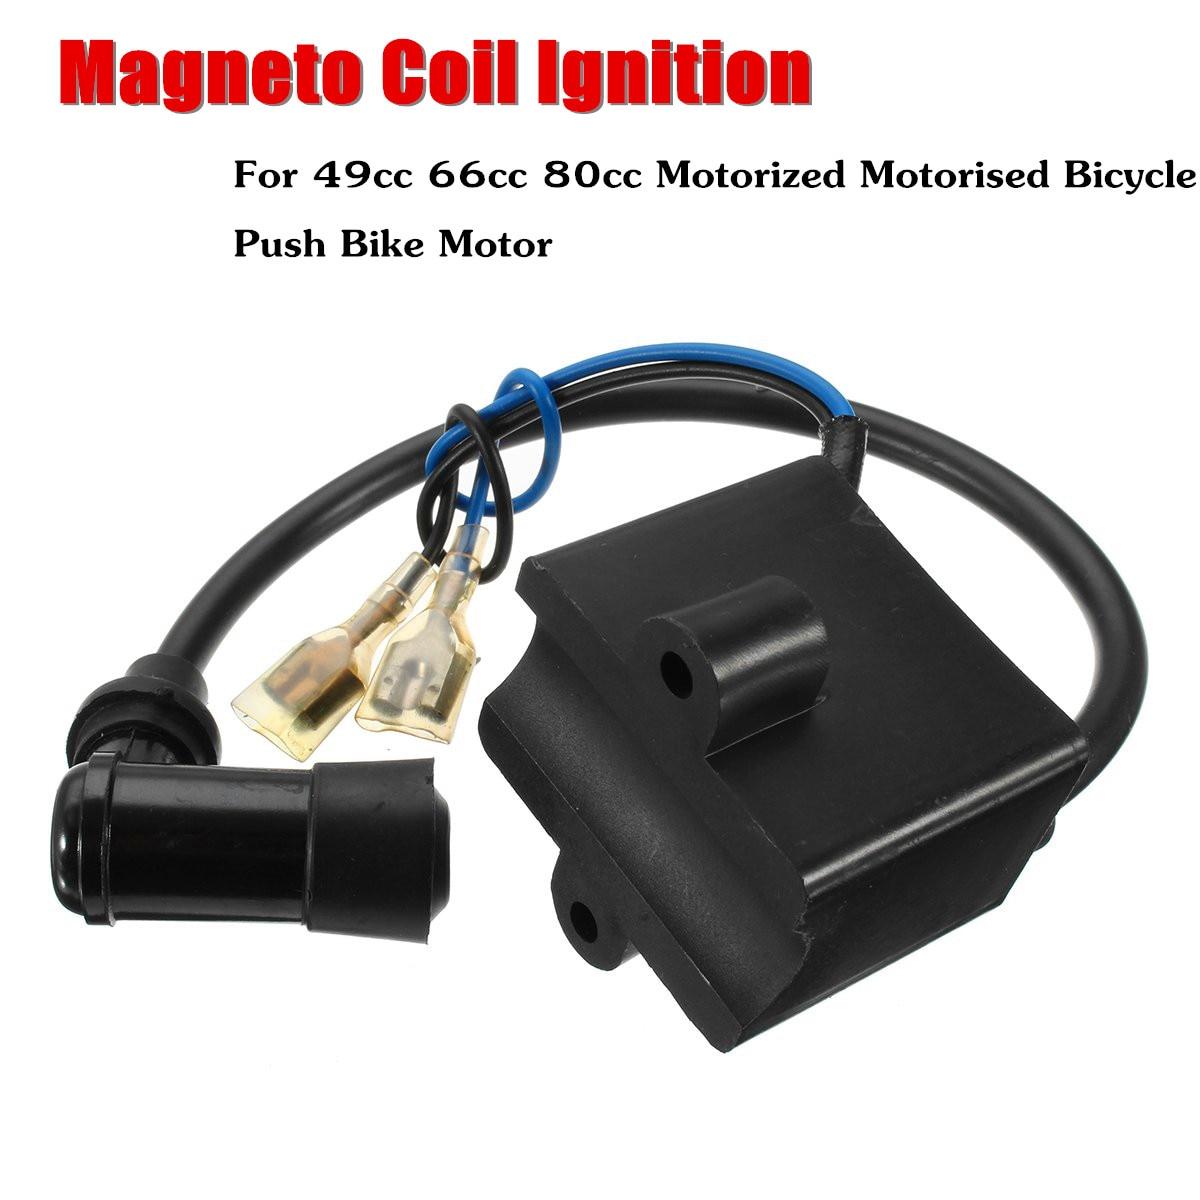 Magneto de bobina de encendido CDI para Motor de bicicleta motorizado de 2 tiempos 49cc 66cc 80cc